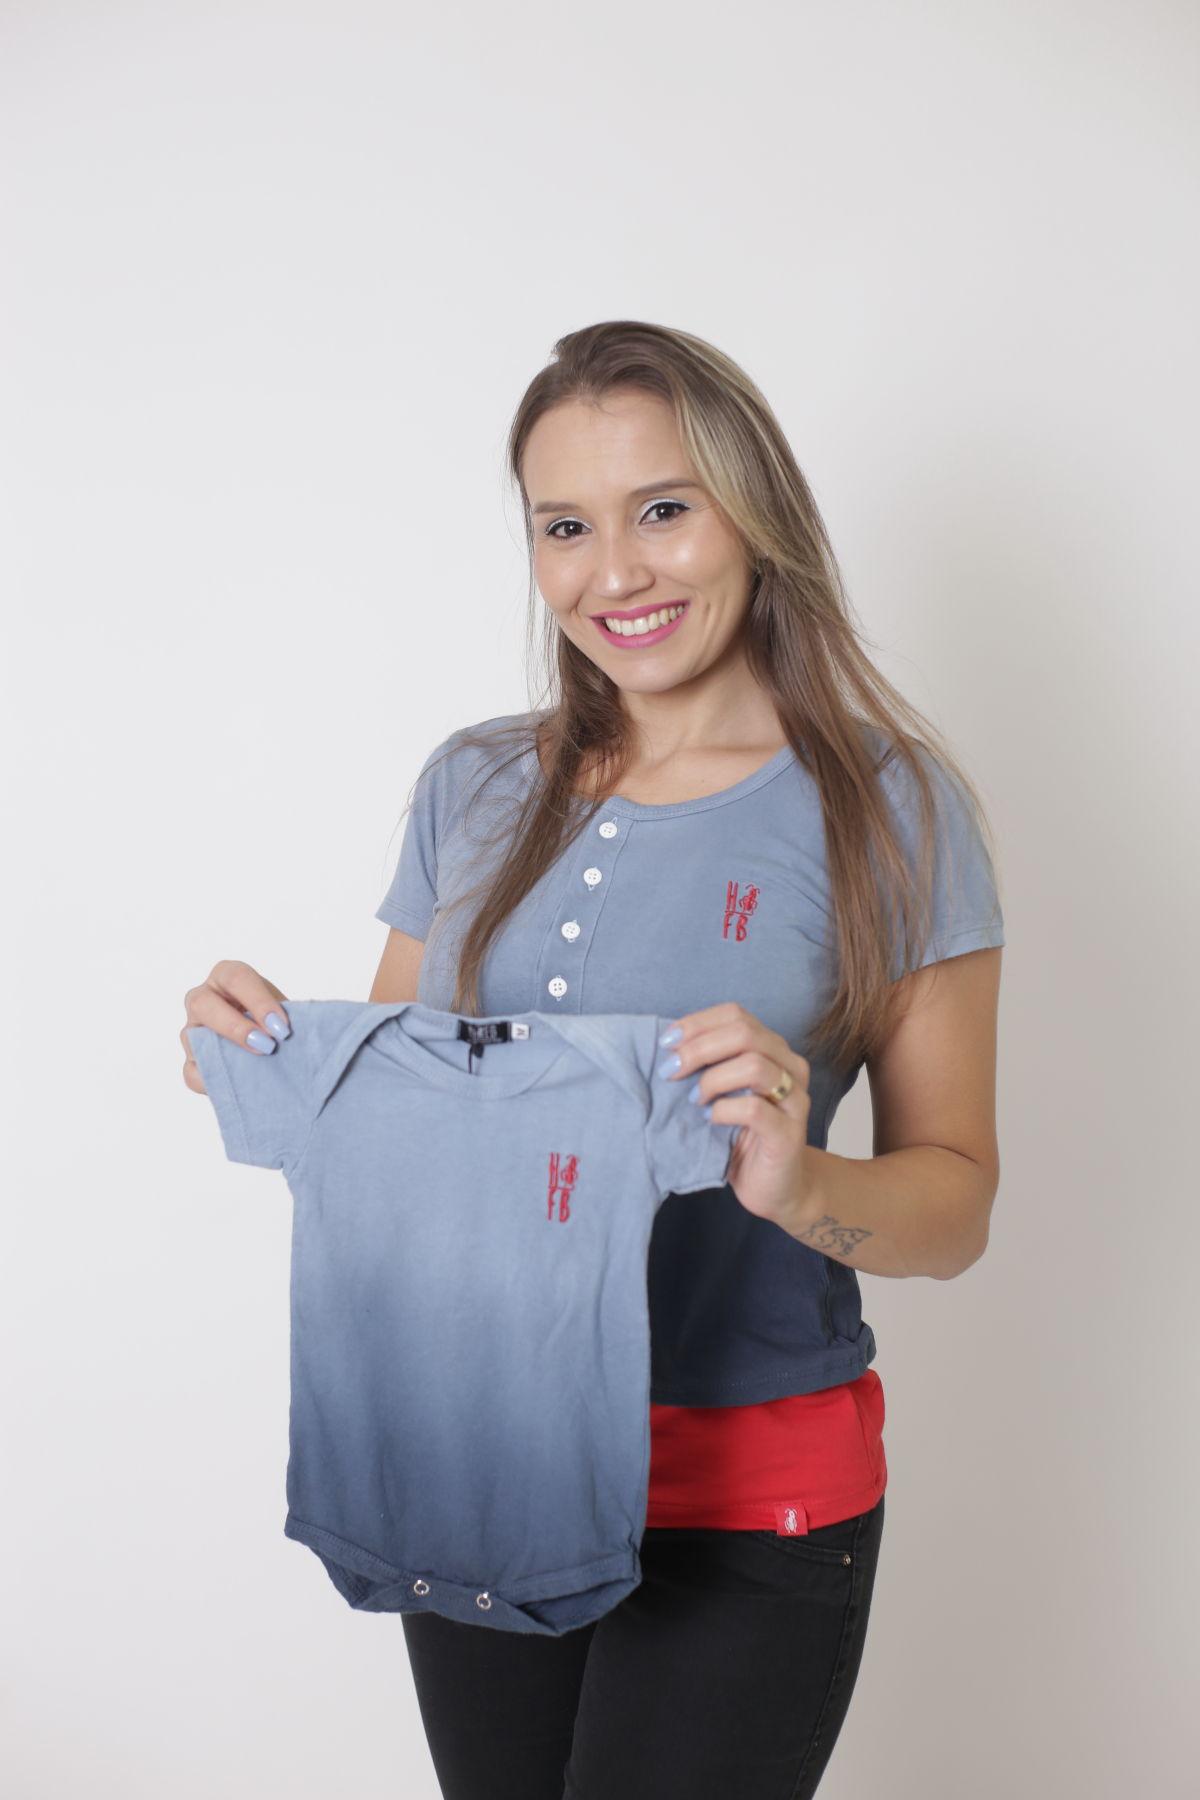 MÃE E FILHOS > Kit 02 Peças T-Shirt Henley + Camiseta ou Body Infantil Unissex - Degradê [Coleção Tal Mãe Tal Filho]  - Heitor Fashion Brazil